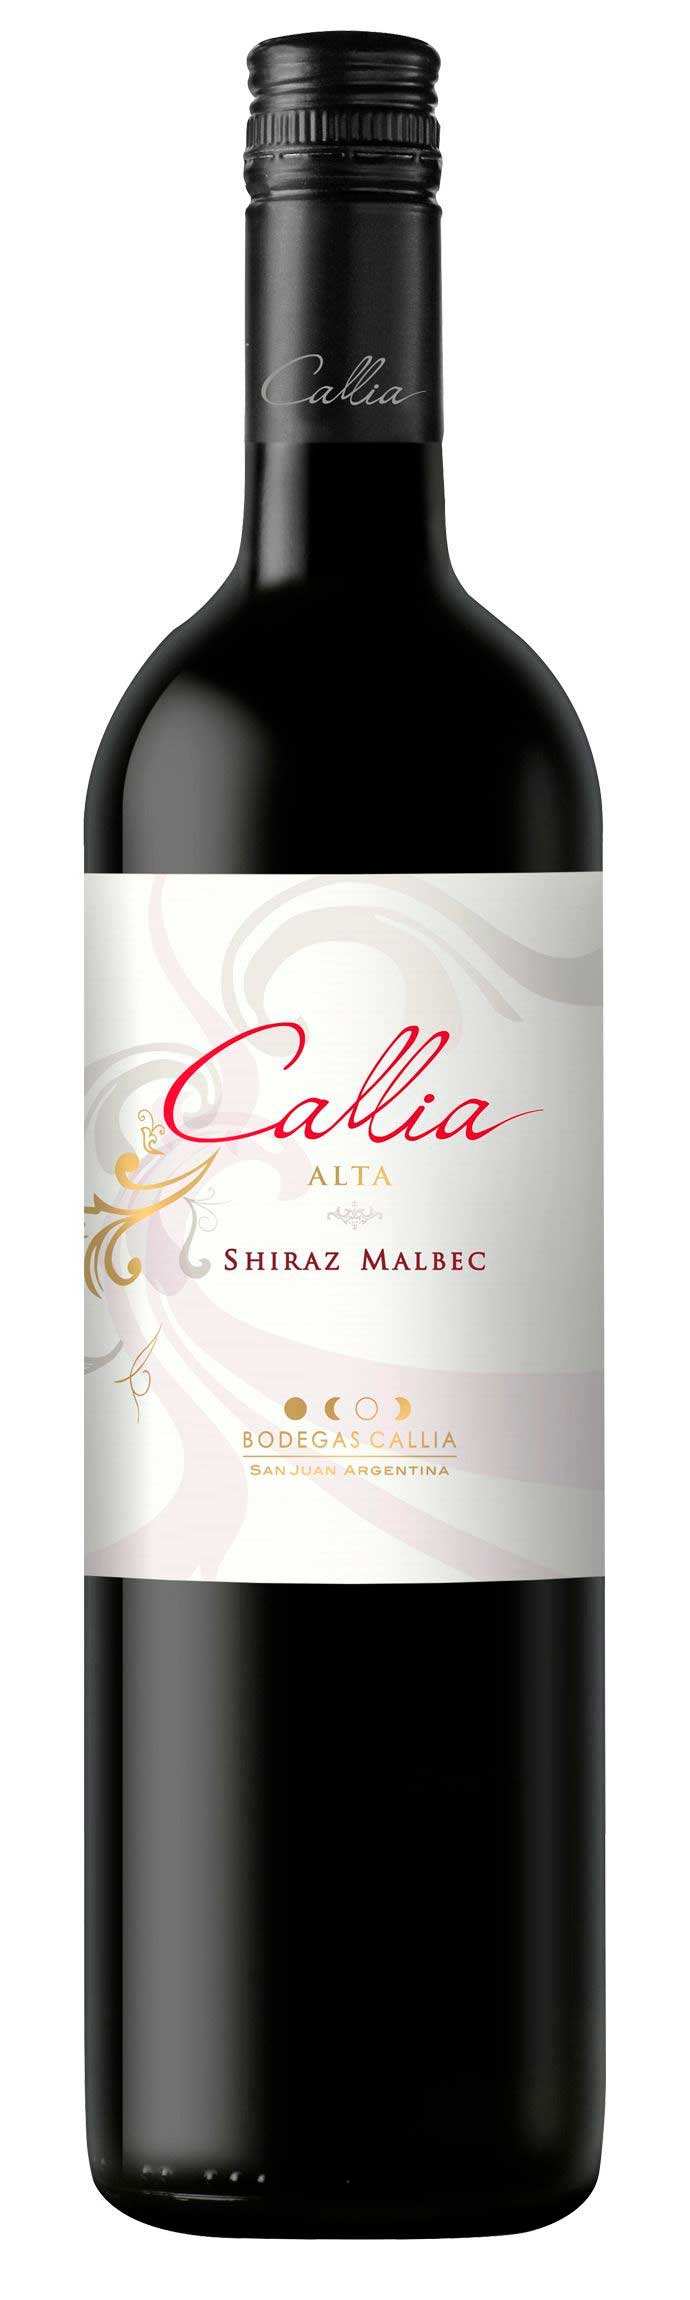 Alta Shiraz Malbec ( Bodegas Callia ) 2015